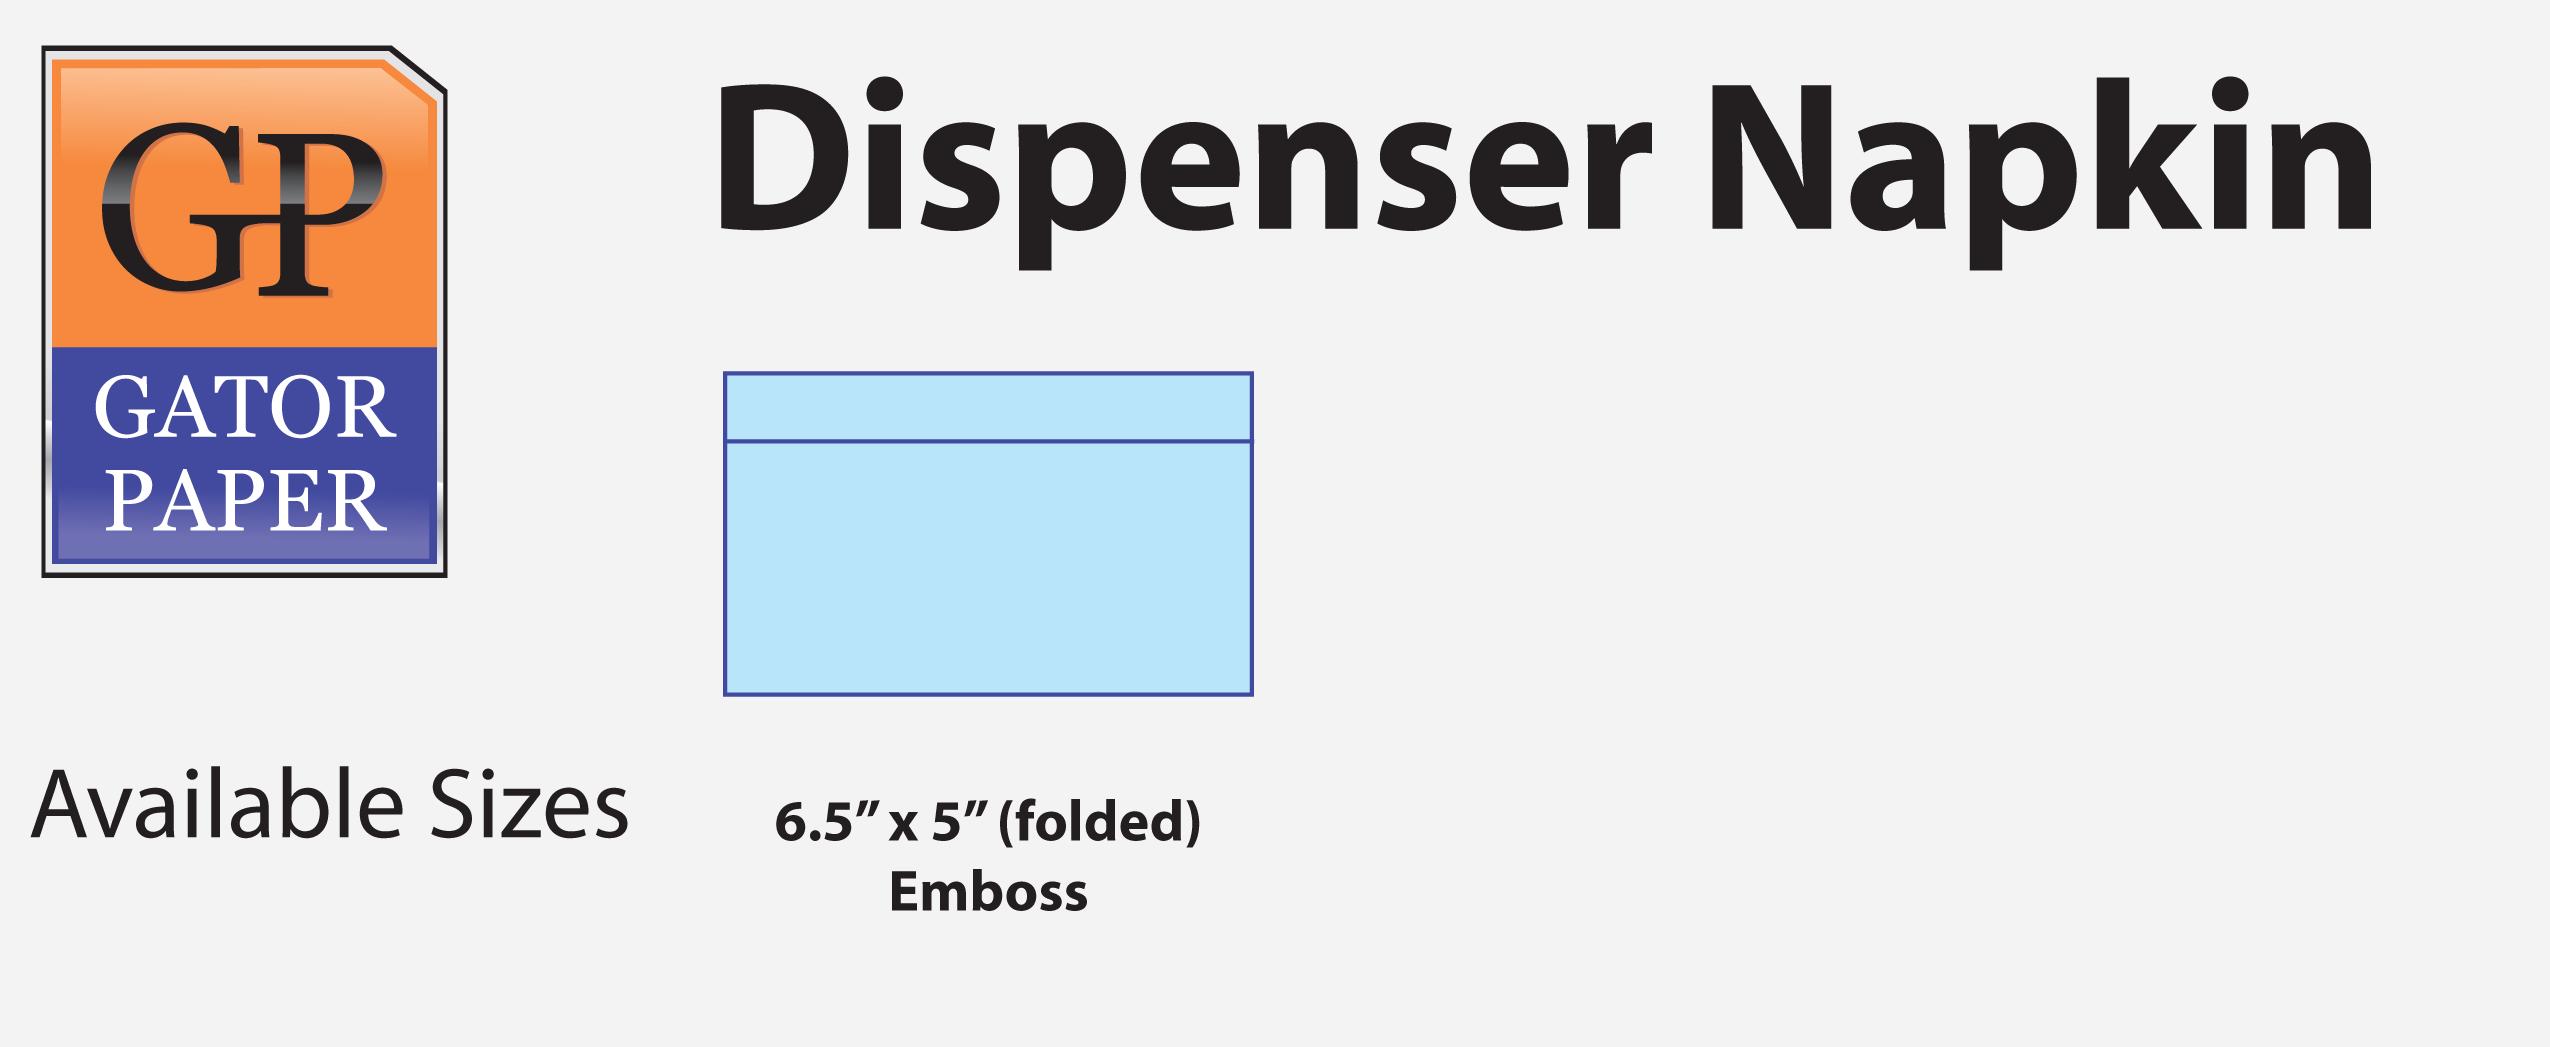 Custom Printed Dispenser Napkins